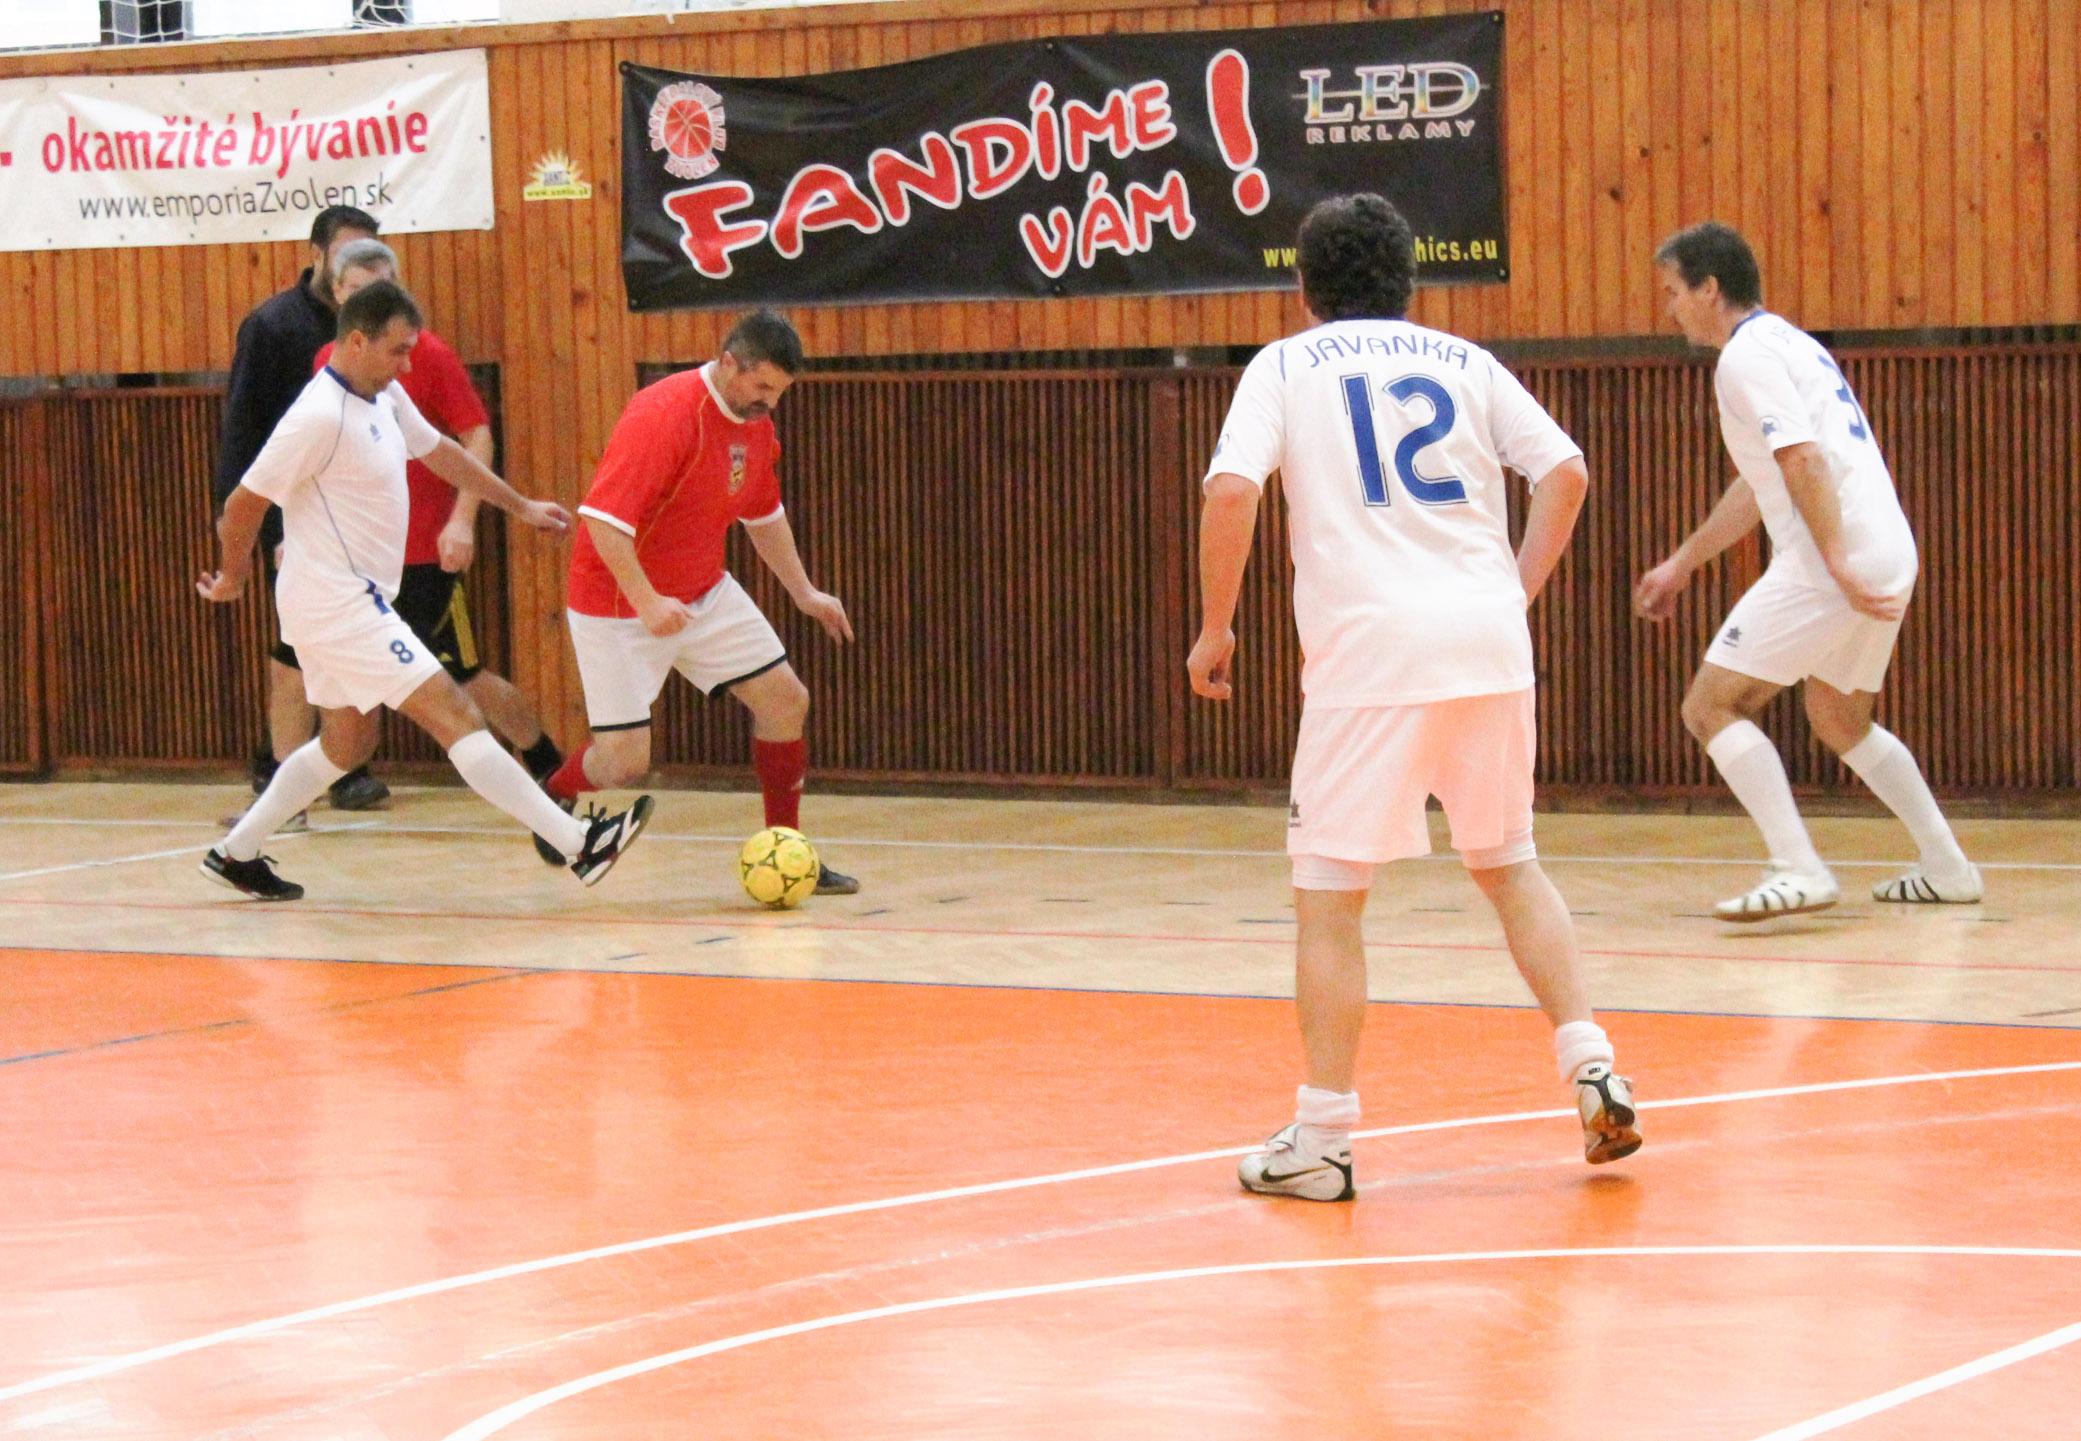 xanto-liga-40-2015-zvolen-4